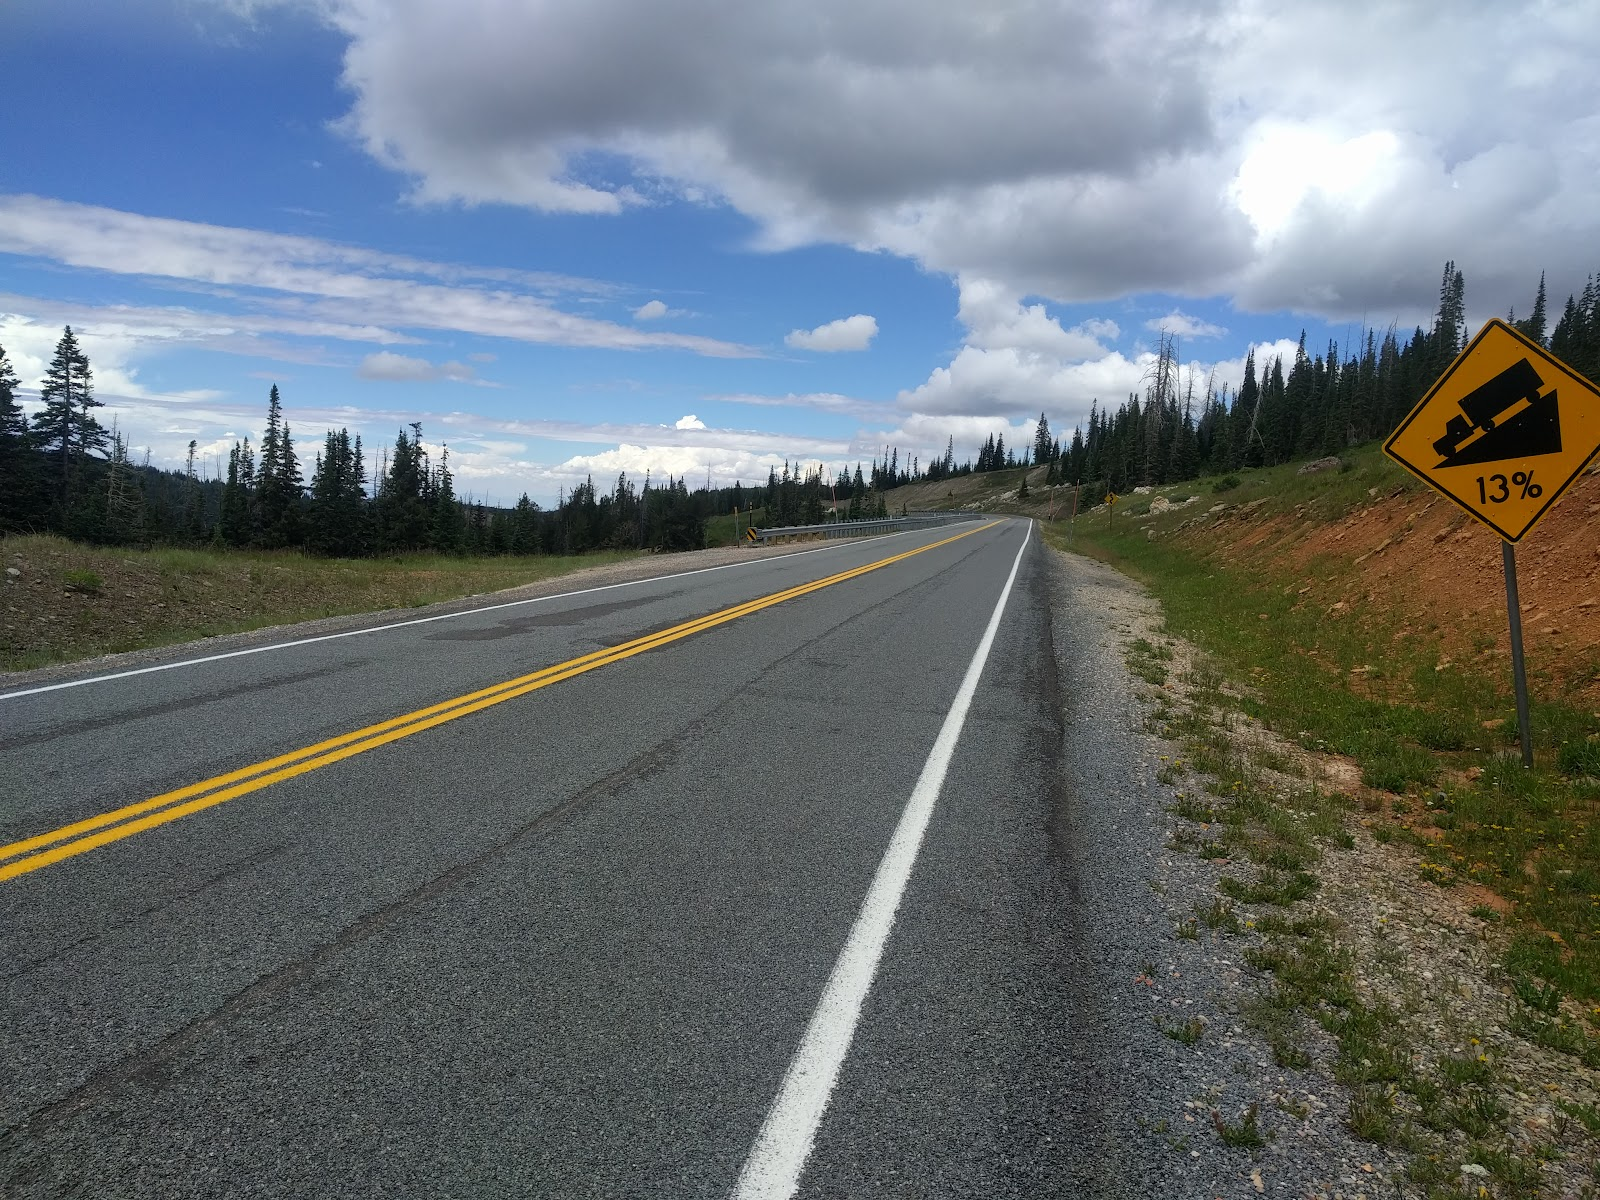 Bike ride up Hwy 143 - Steep grade sign at end.